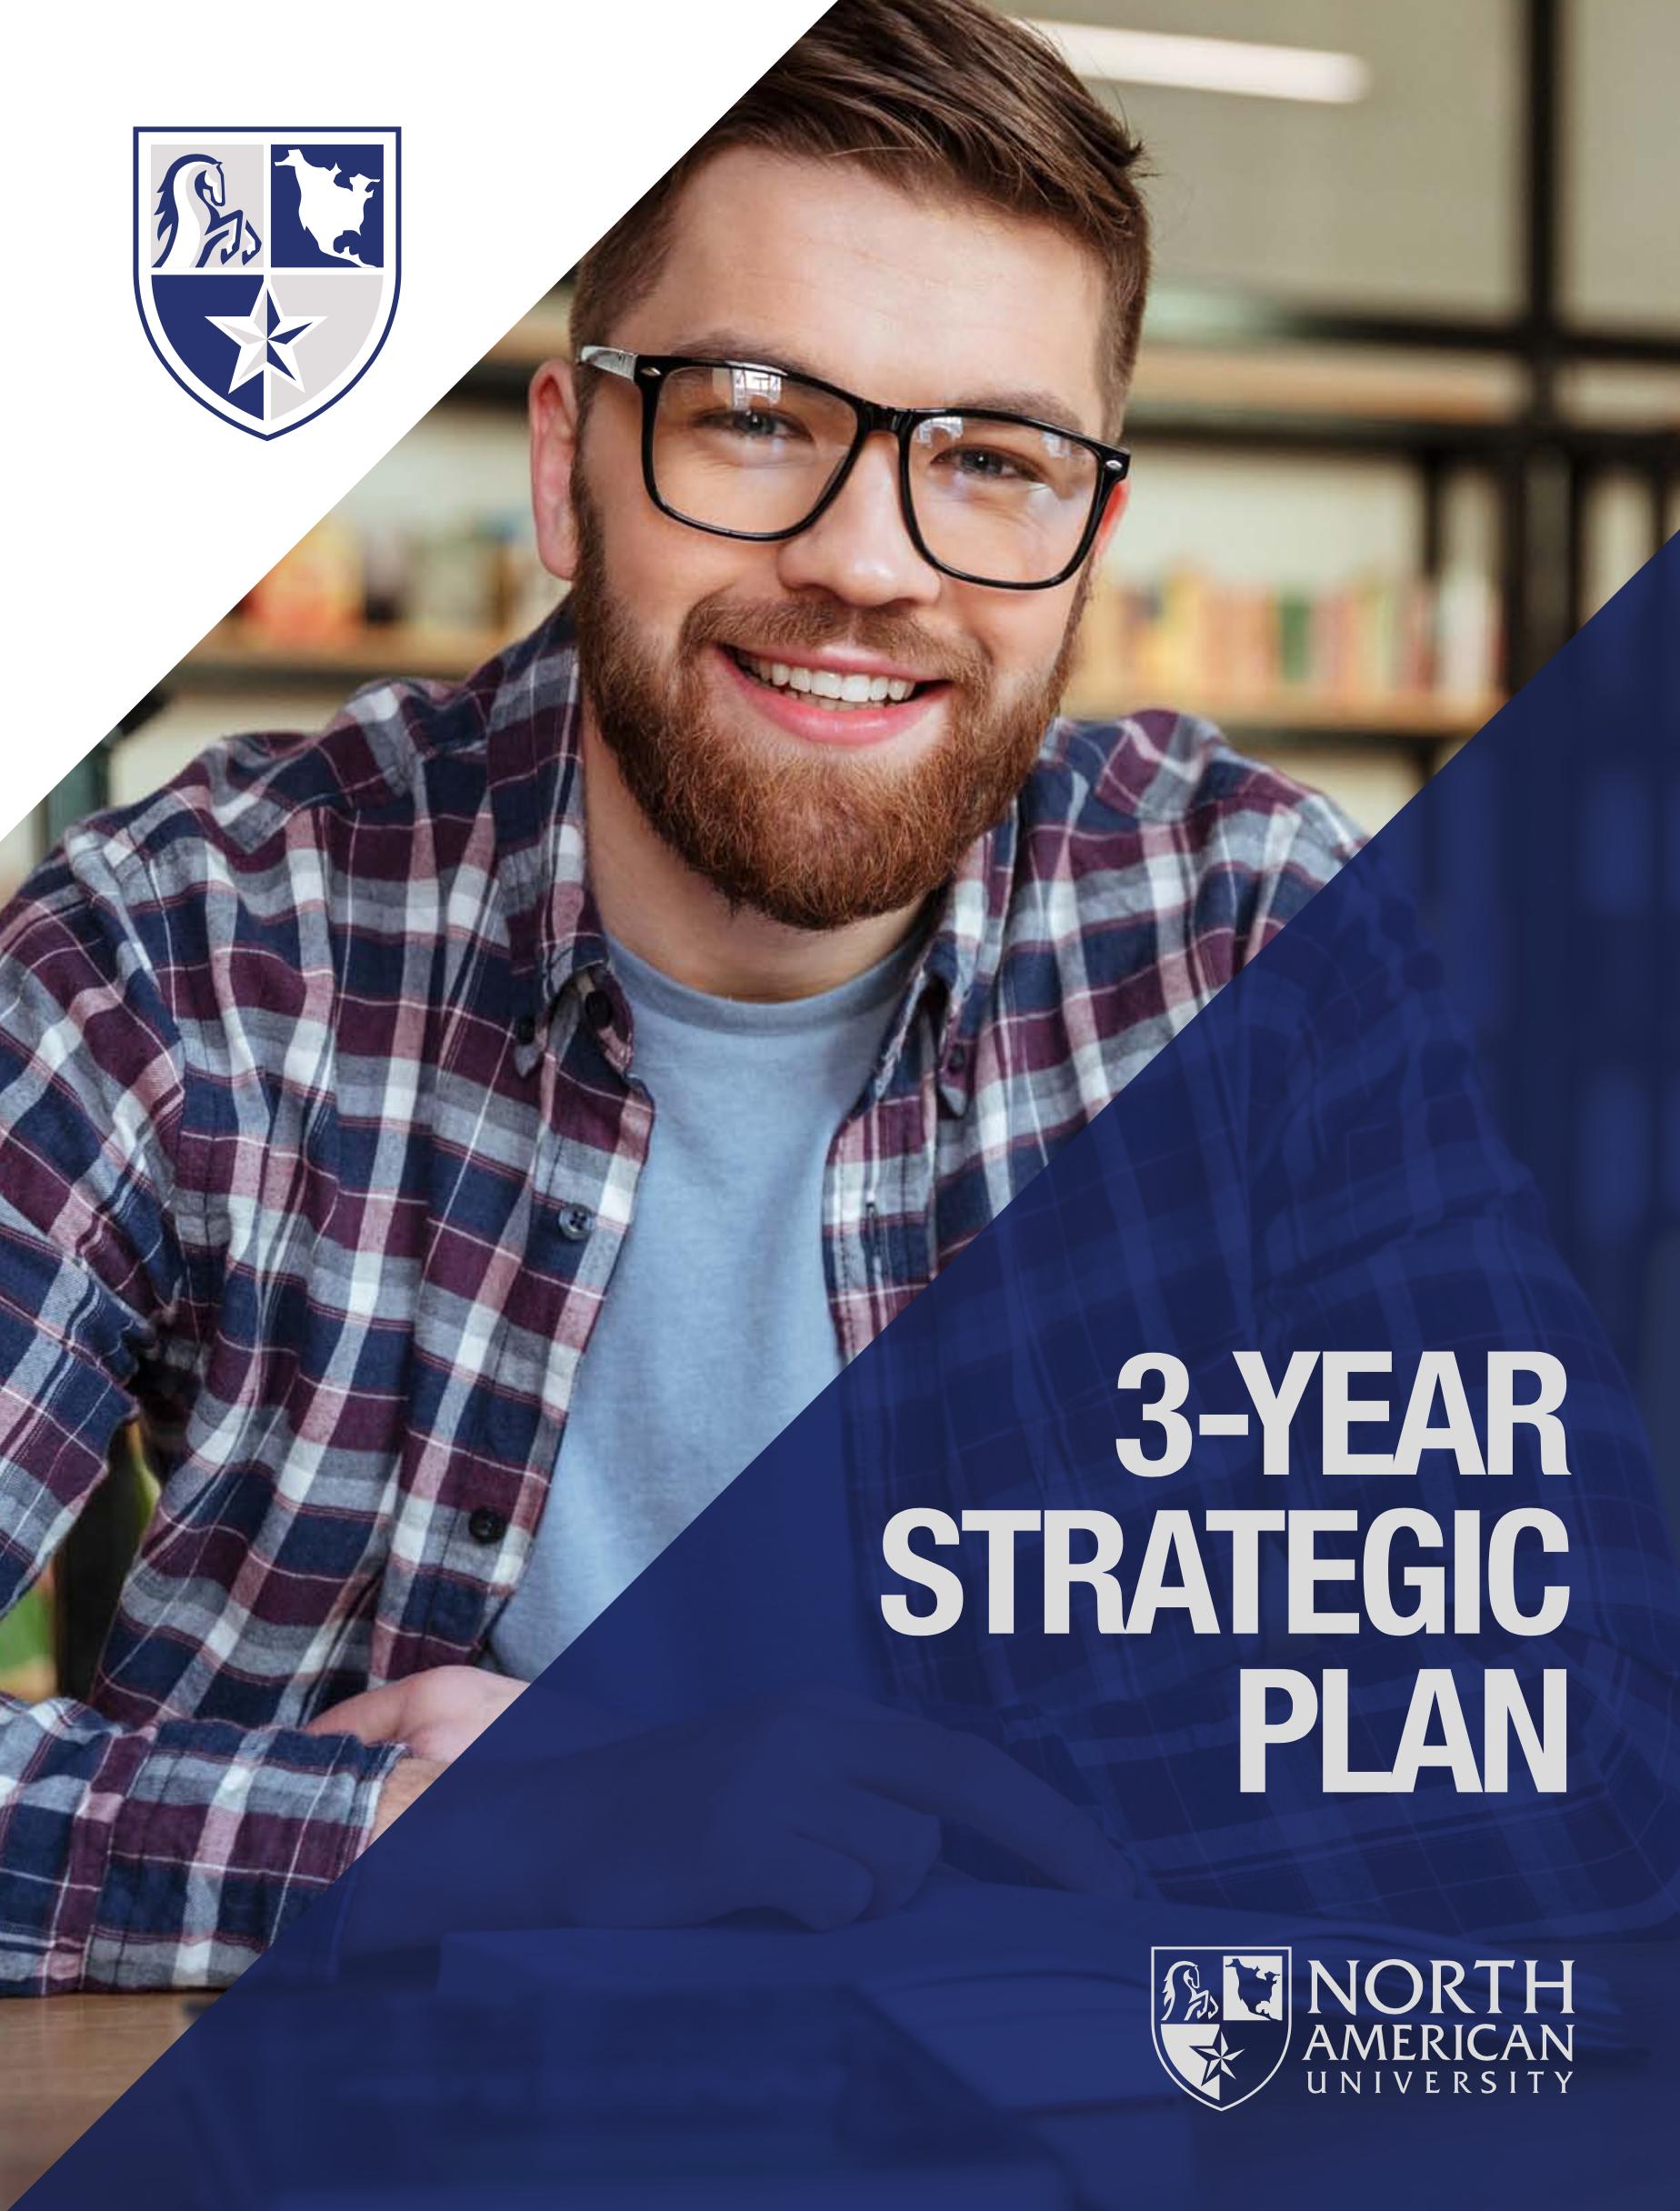 3-Year Strategic Plan